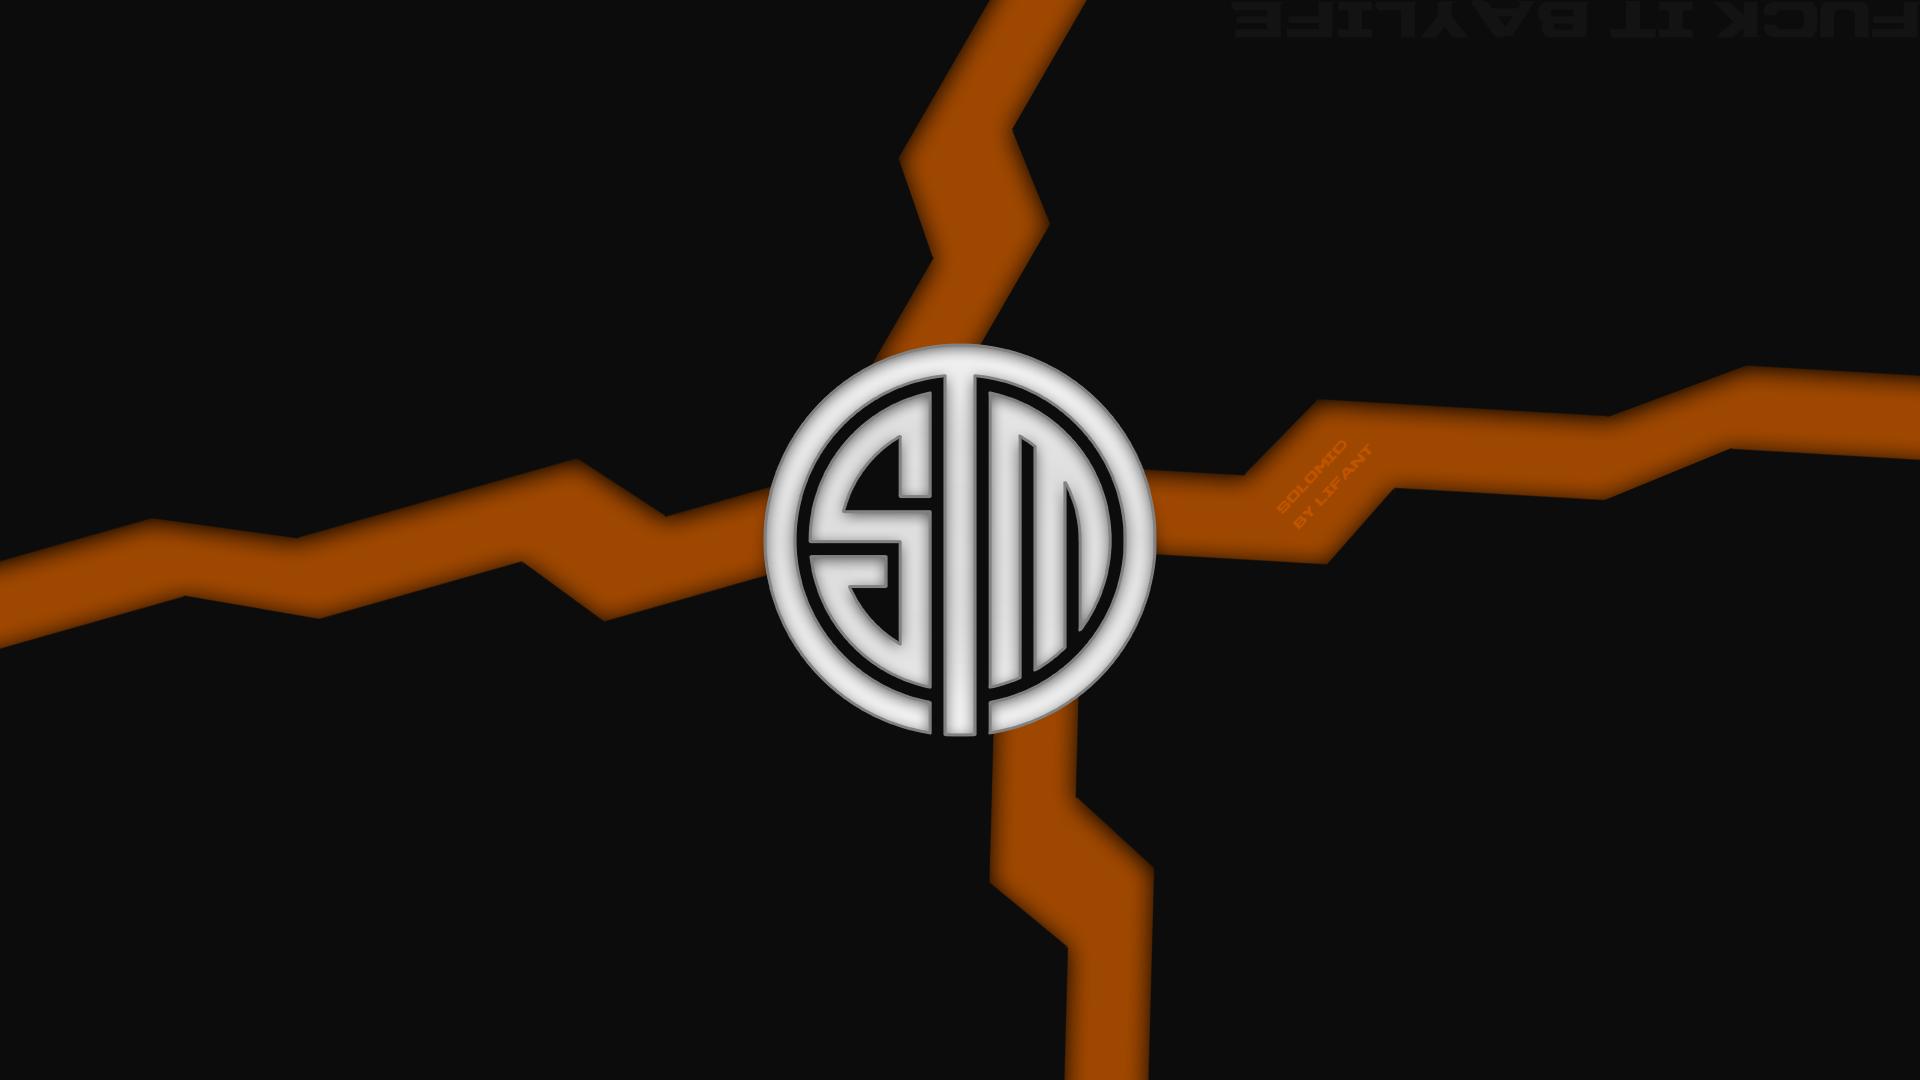 TSM Wallpaper | CS:GO Wallpapers and Backgrounds